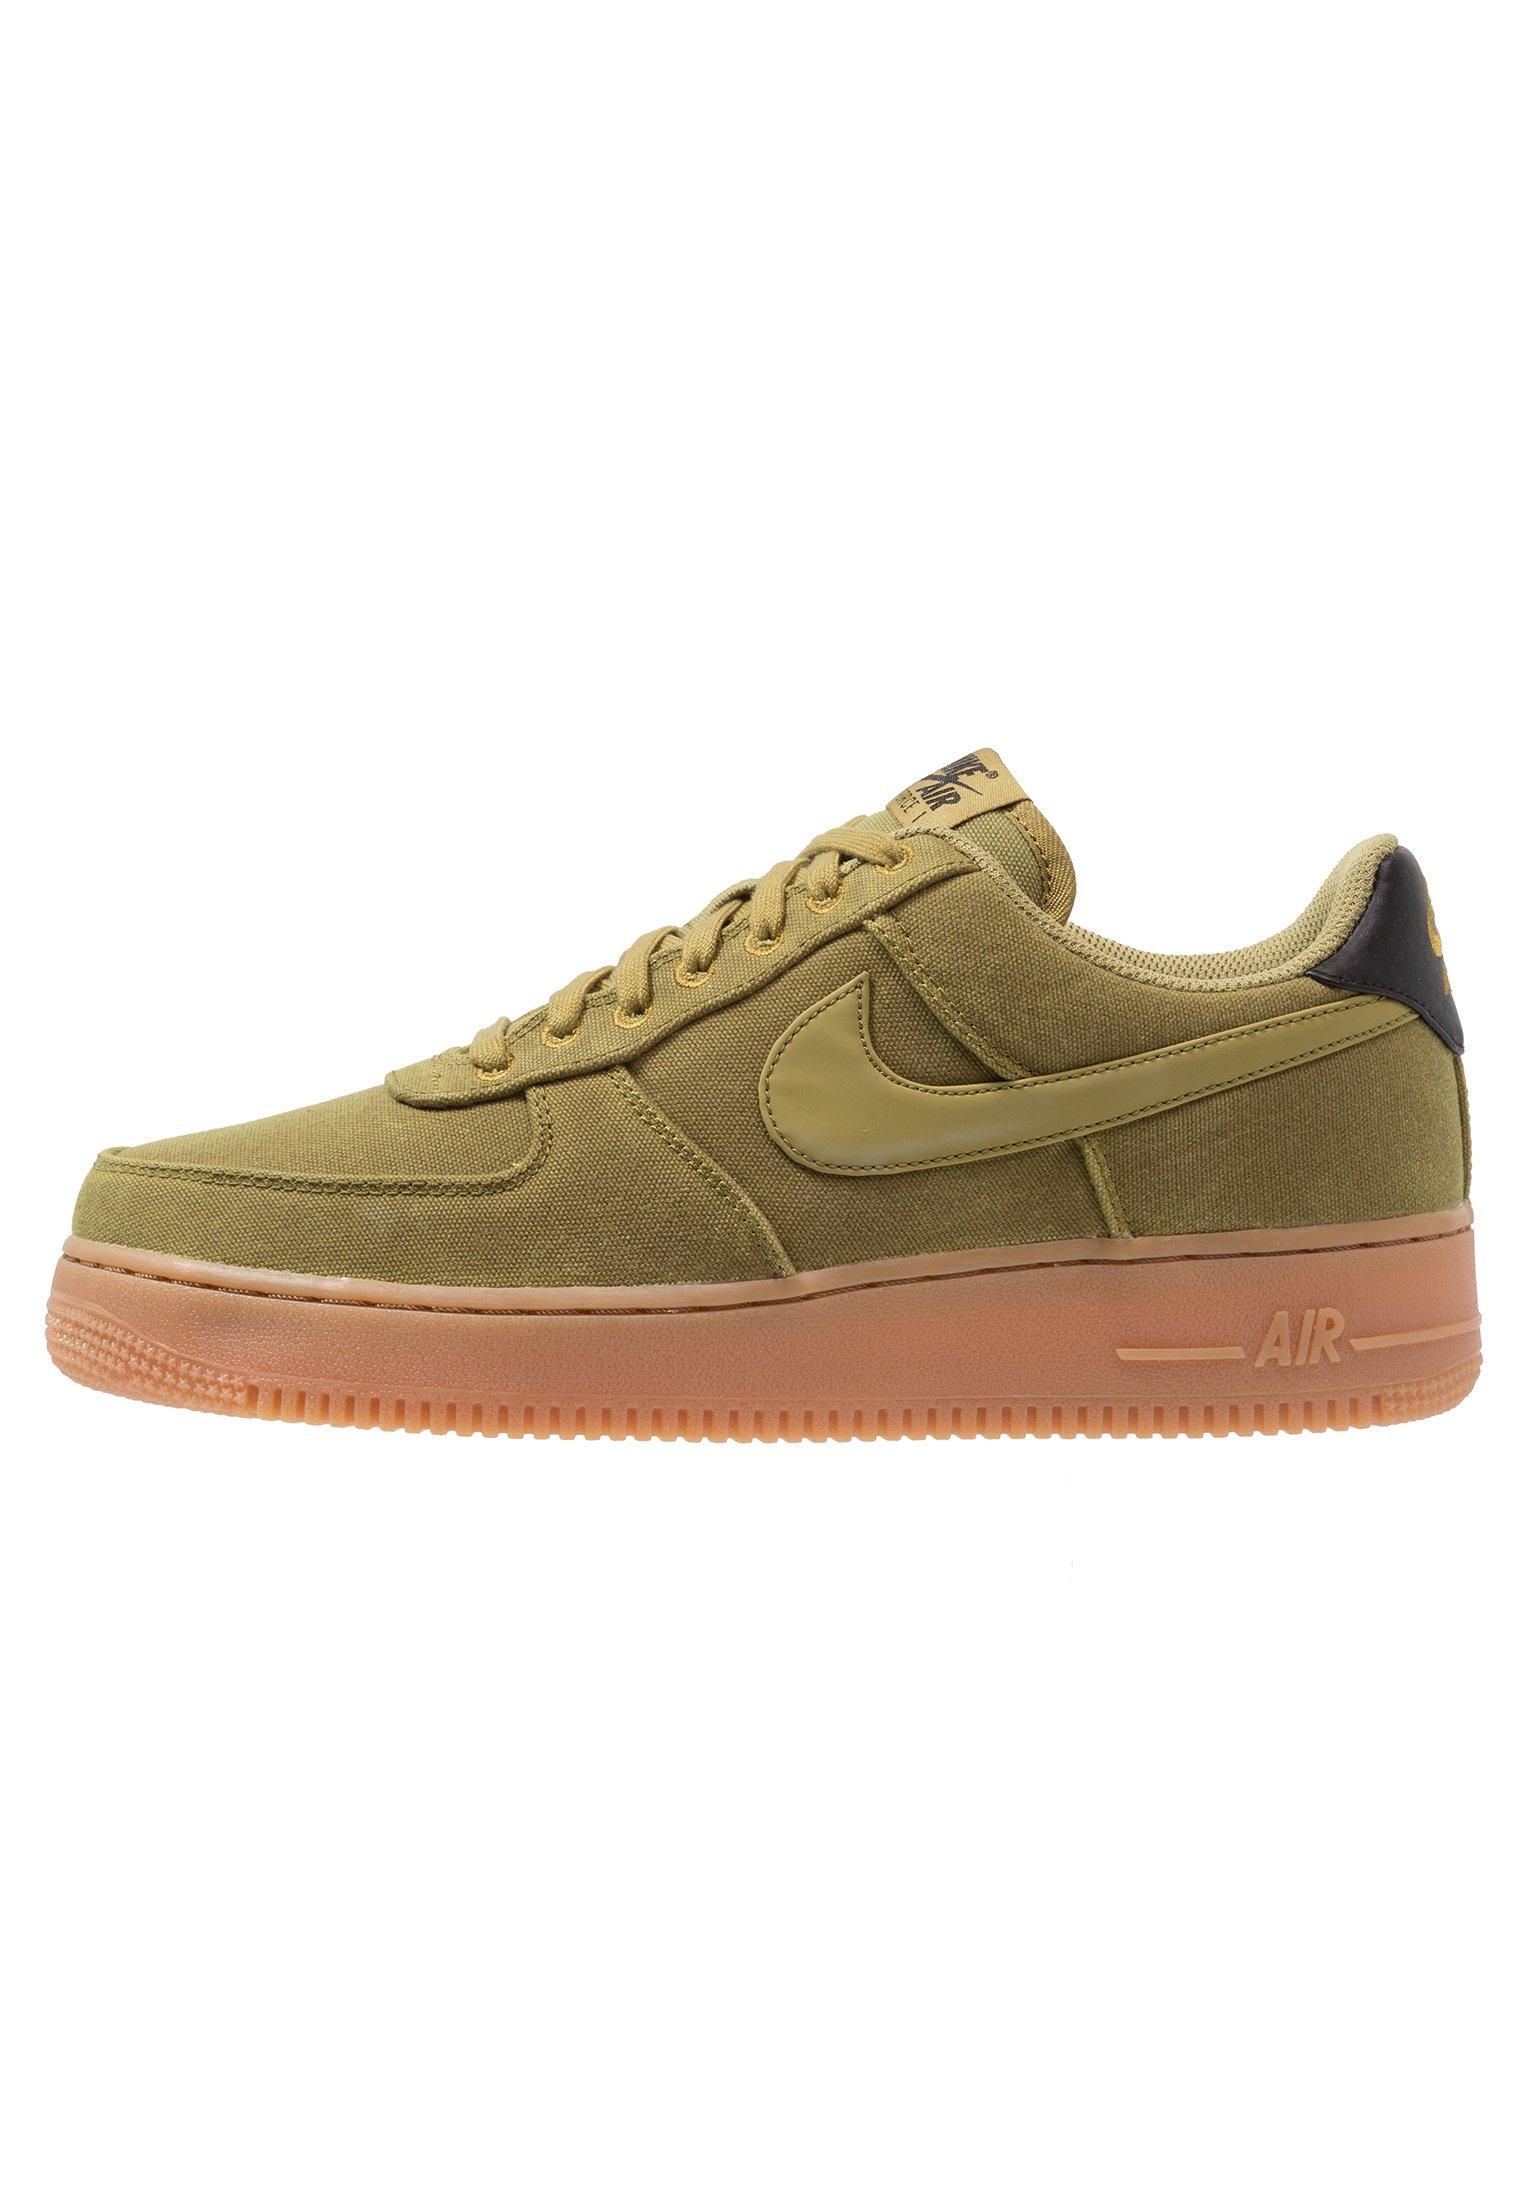 AIR FORCE 1 '07 LV8 STYLE Sneakers basse greenmedium brownblack